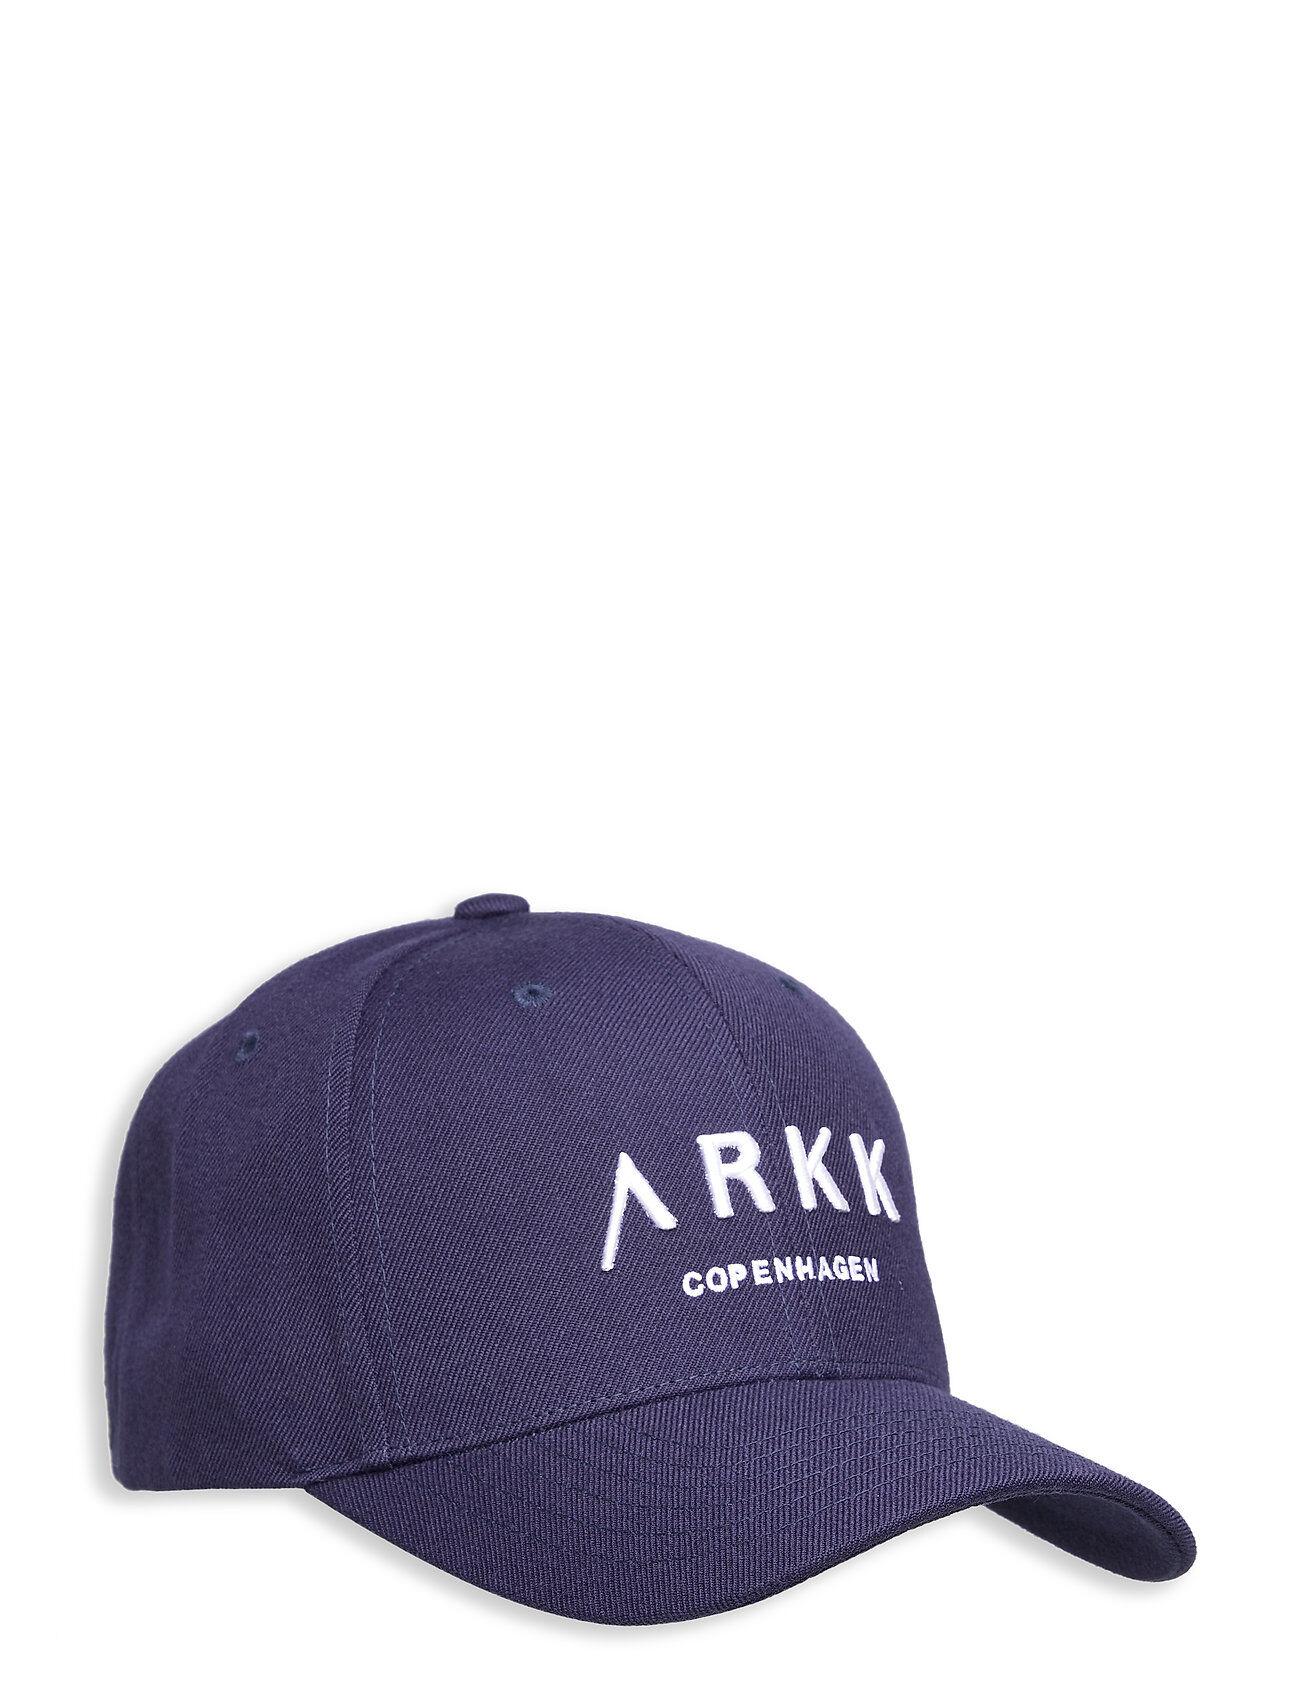 ARKK Copenhagen Baseball Cap Navy Accessories Headwear Caps Sininen ARKK Copenhagen